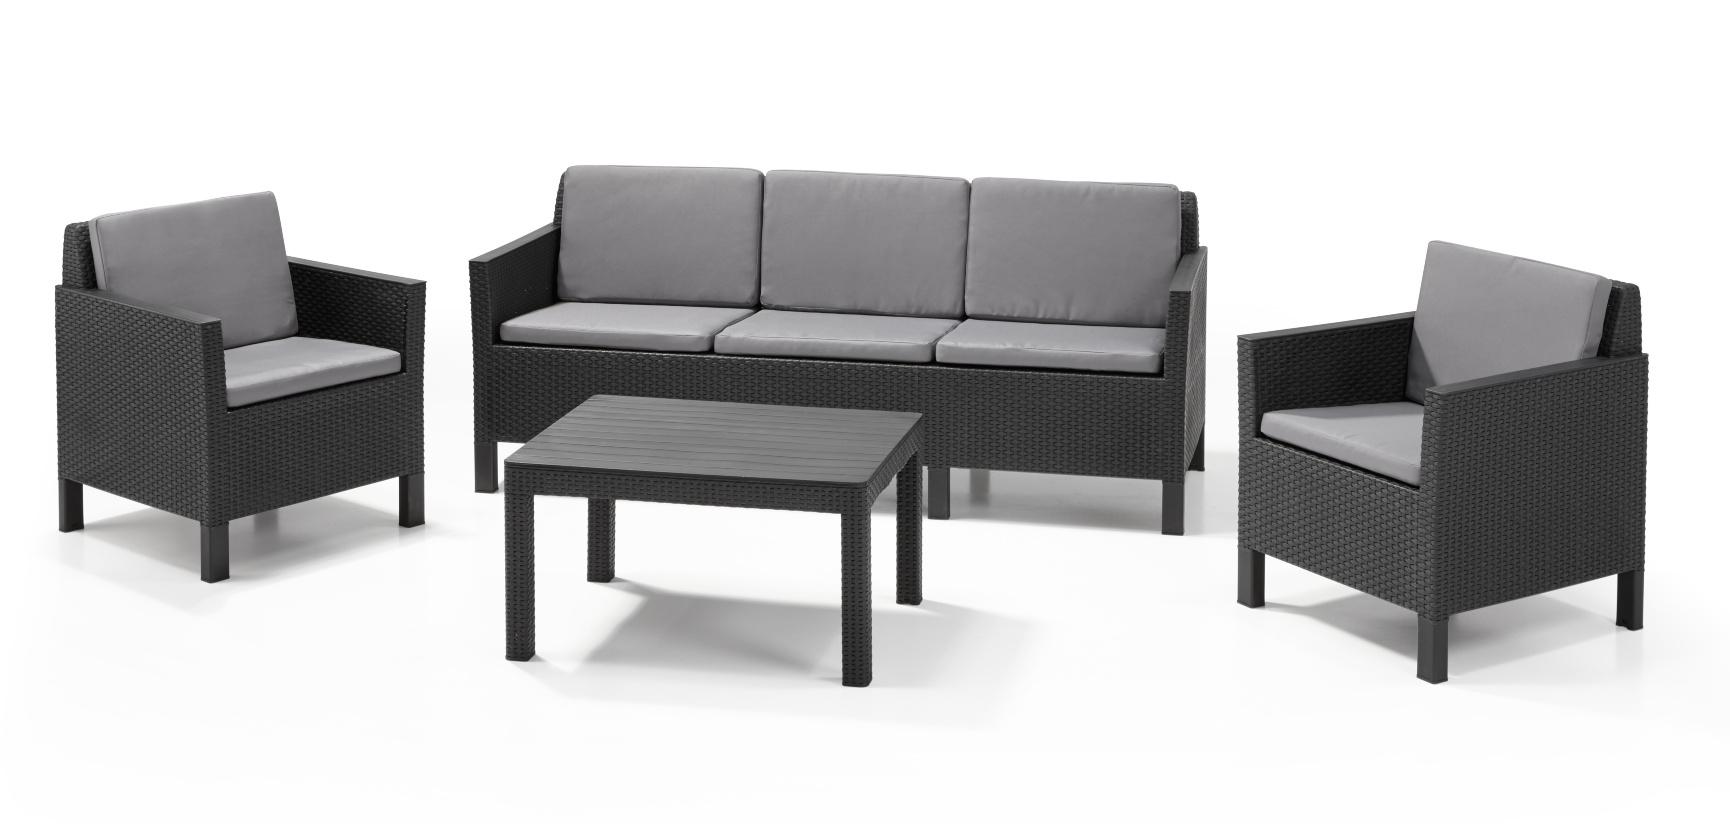 allibert chicago lounge set graphite three seater allibert. Black Bedroom Furniture Sets. Home Design Ideas